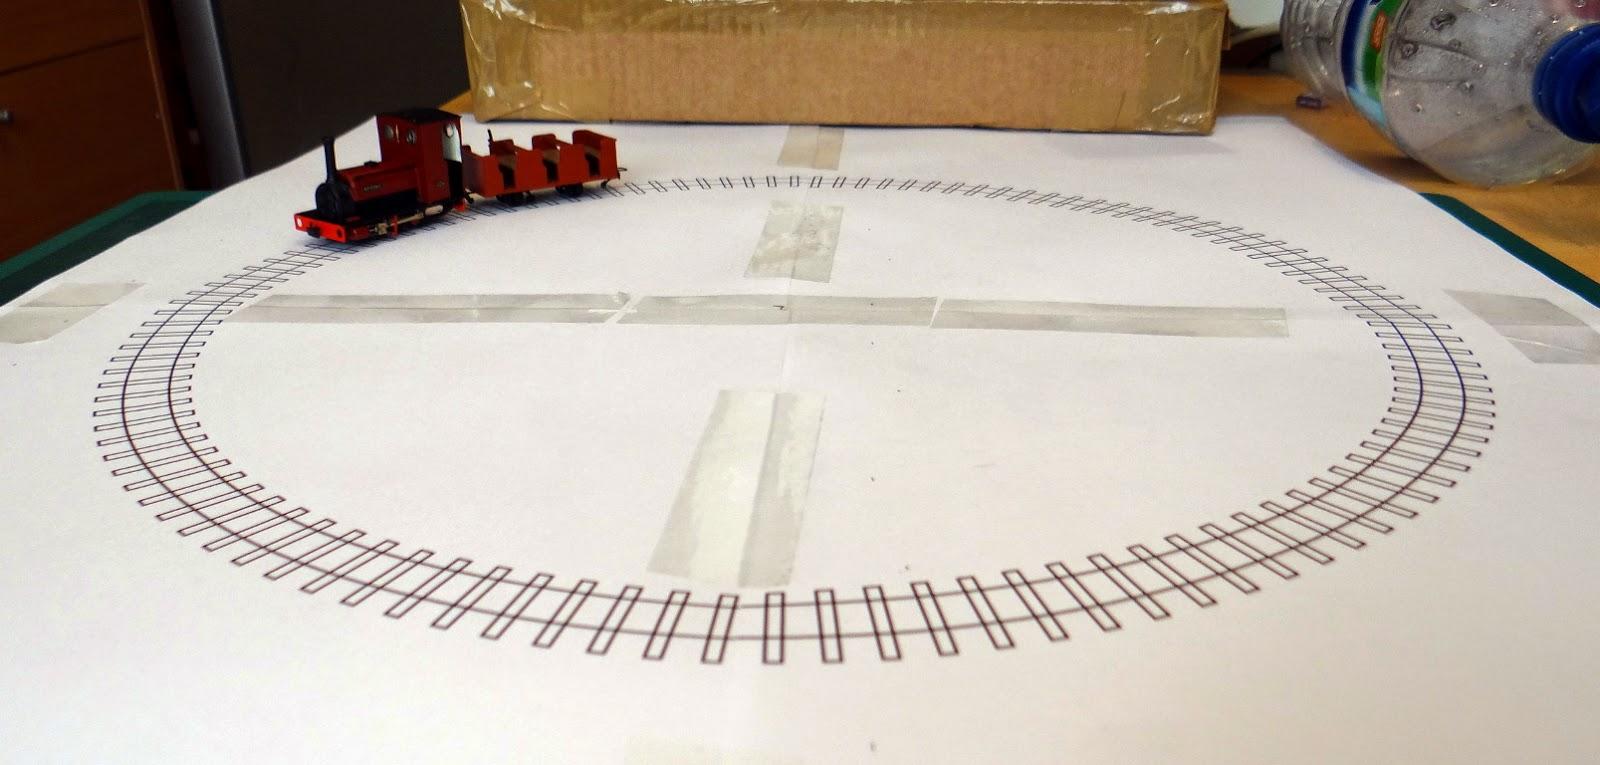 Ausgezeichnet Ho Skala Track Vorlagen Fotos - Entry Level Resume ...